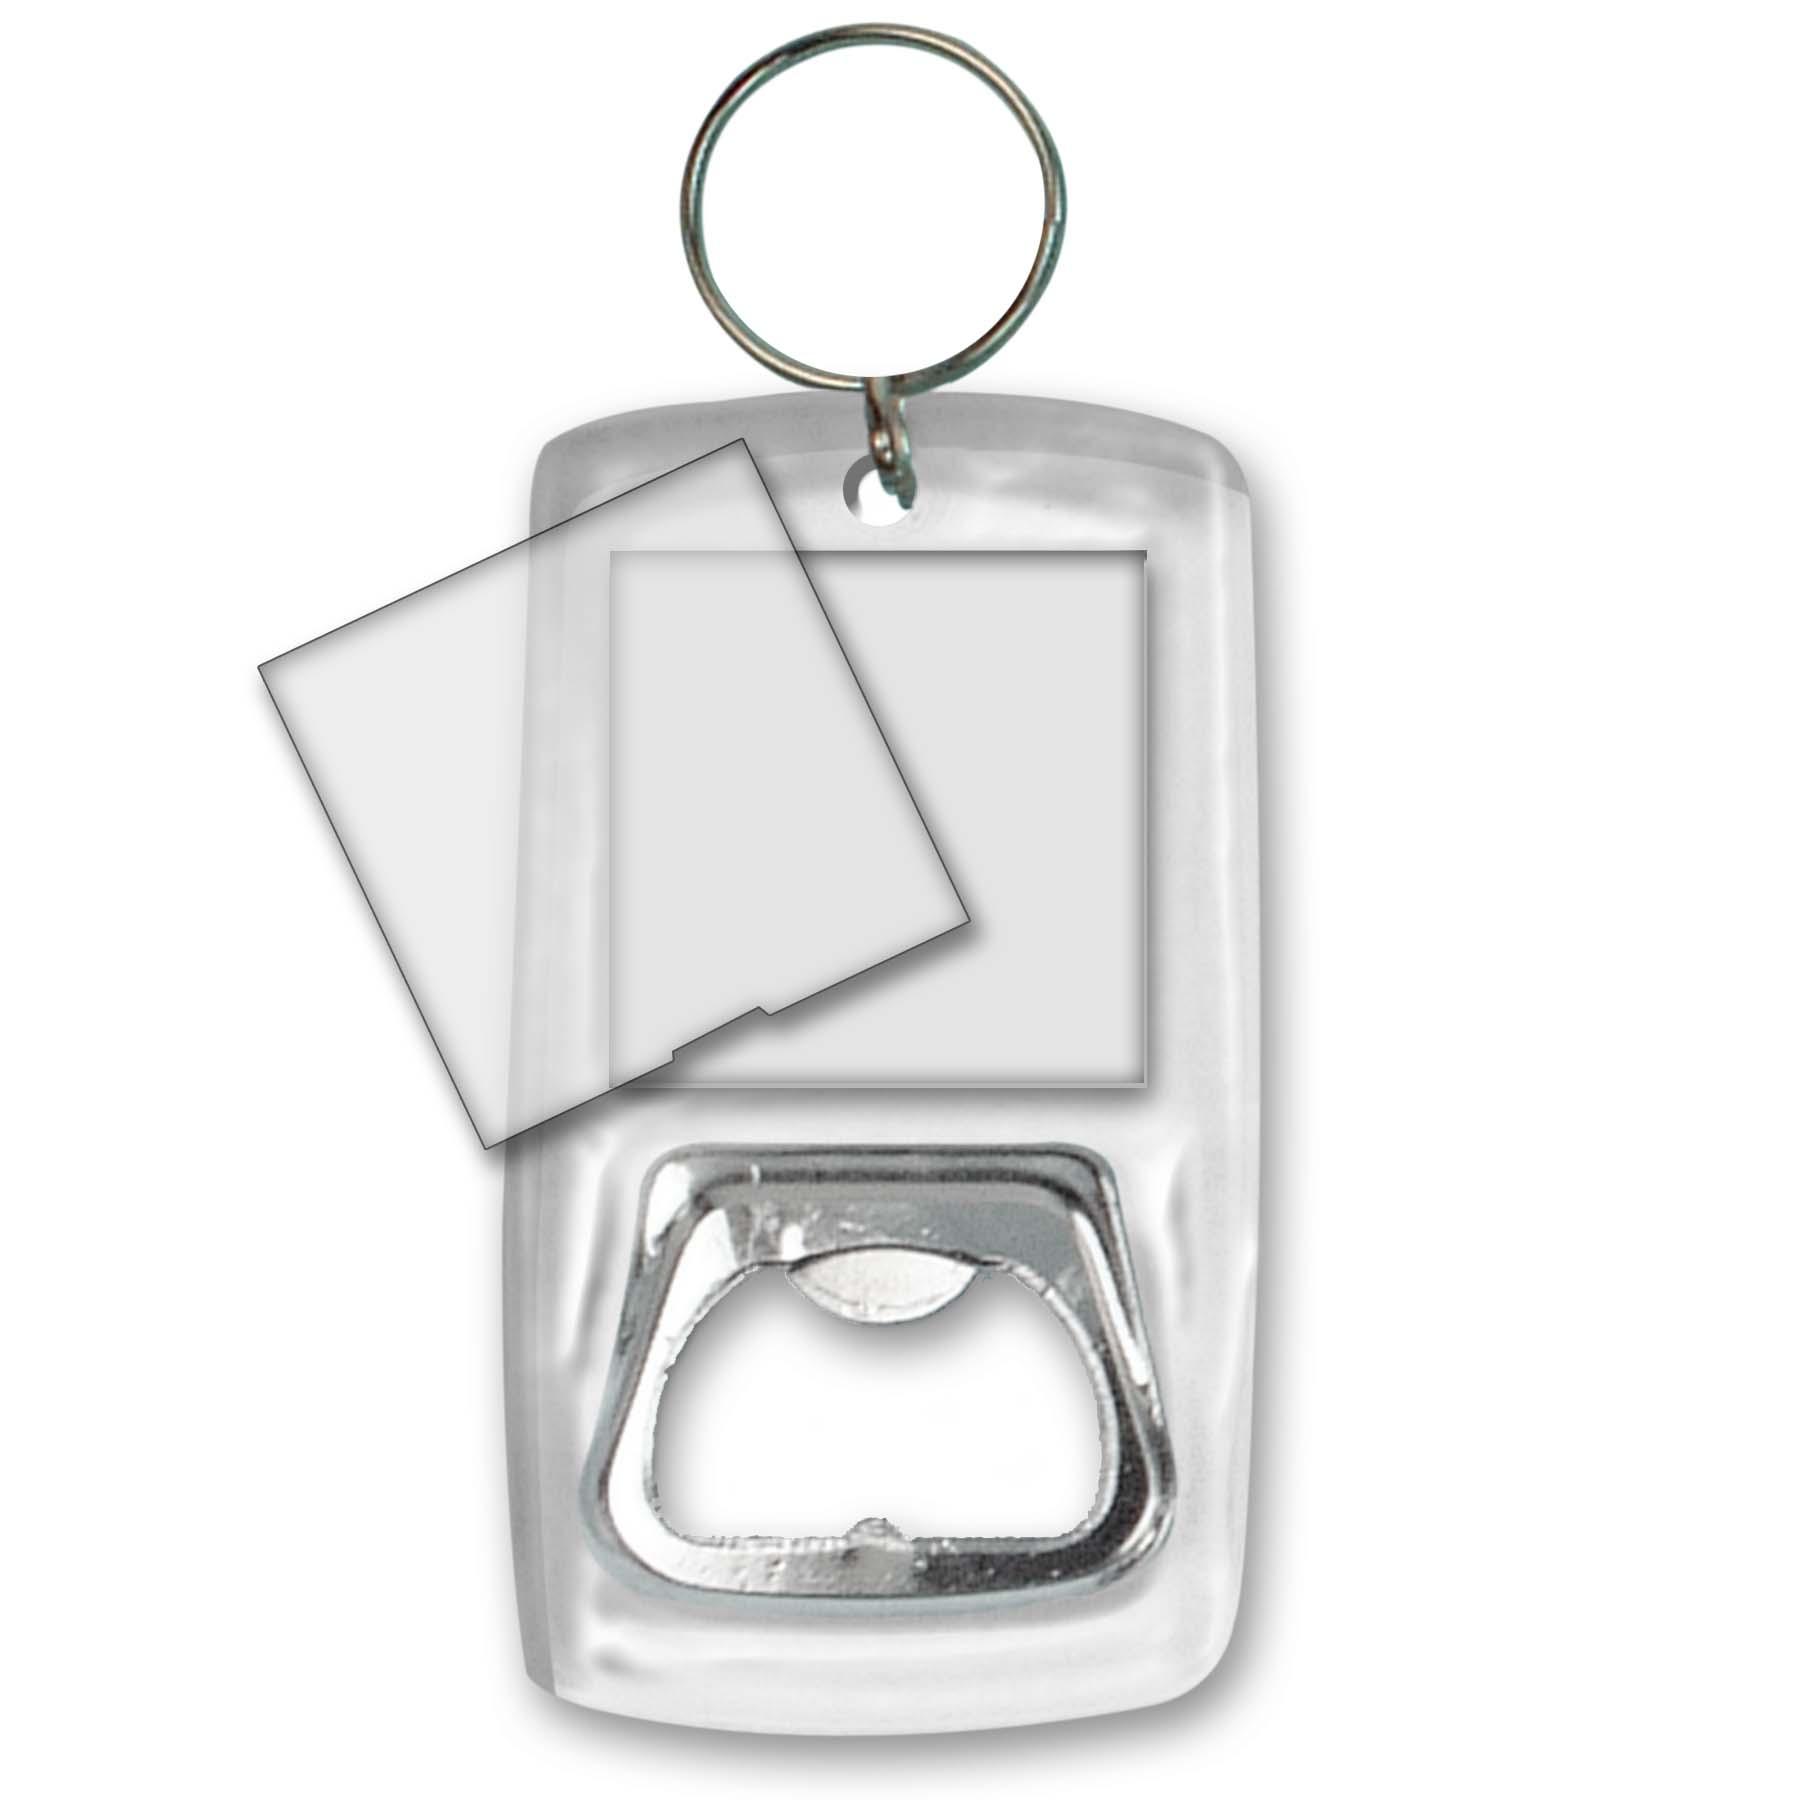 bottle opener blank photo key chain clear acrylic case lot of 12 boa blank s12 ebay. Black Bedroom Furniture Sets. Home Design Ideas